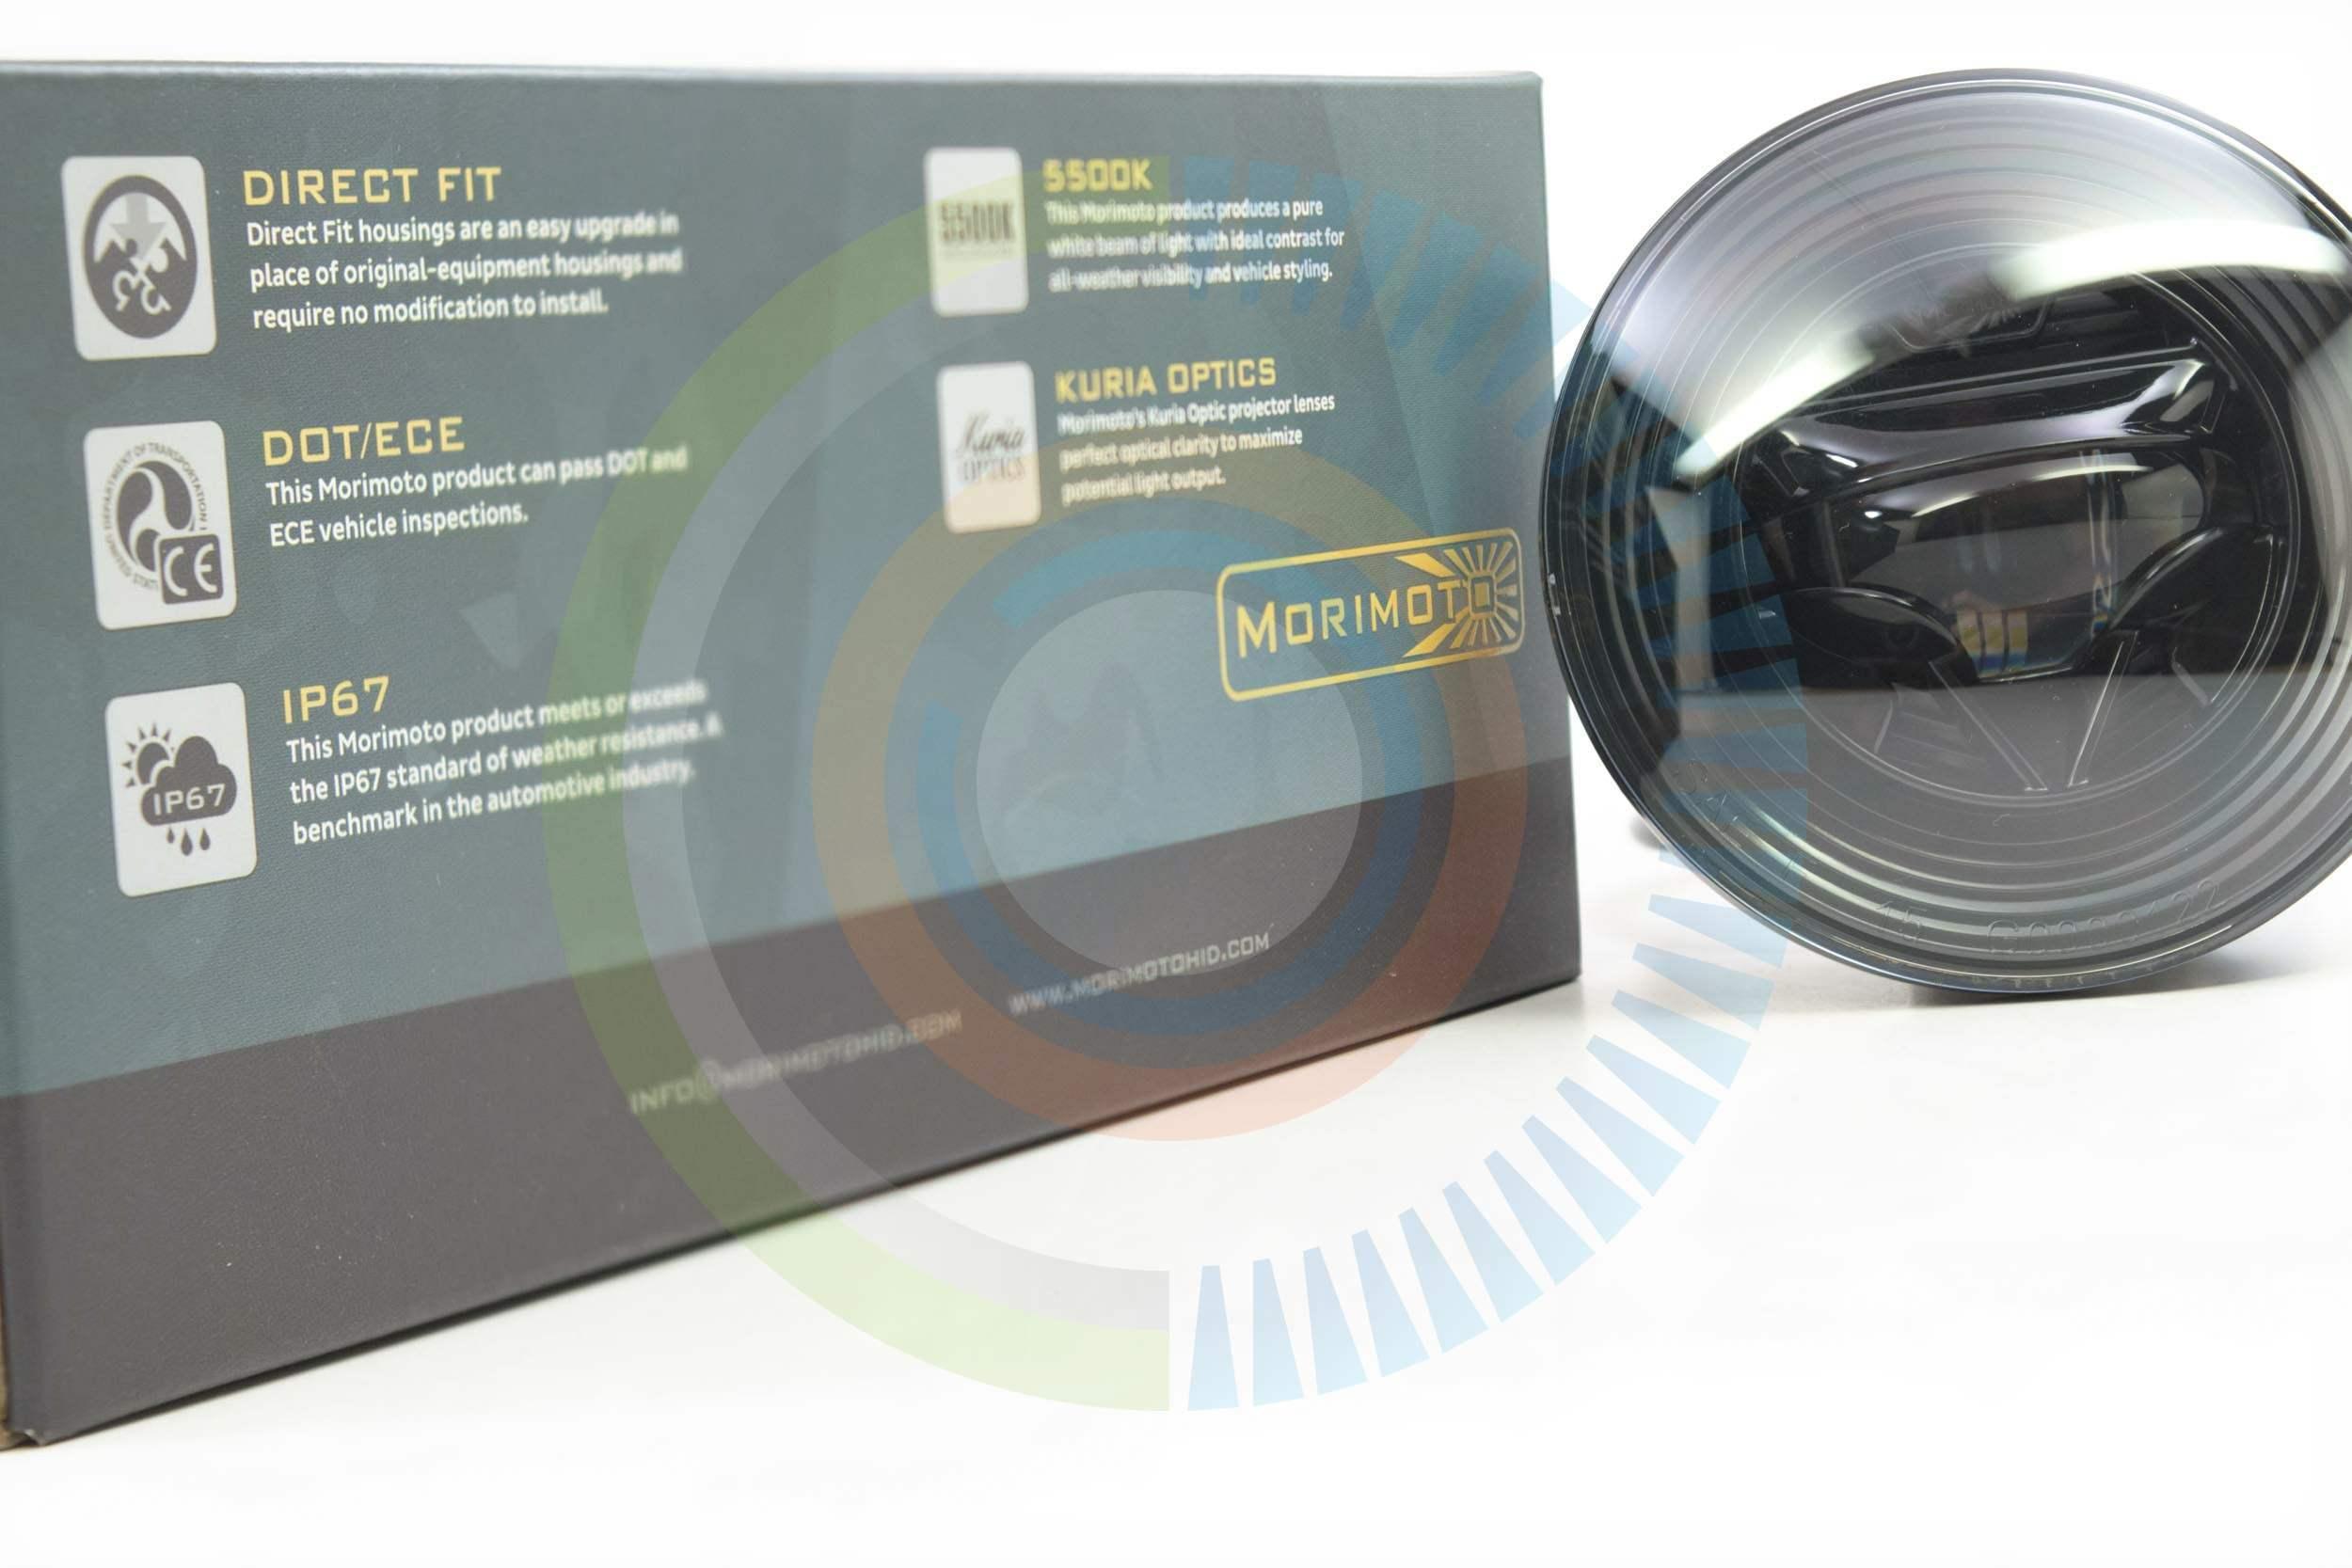 Morimoto Xb Led Fog Lights Gmc Winnipeg Hid Wiring Harness 2007 2013 Sierra Pickup Plug And Play Light Type Gm 5